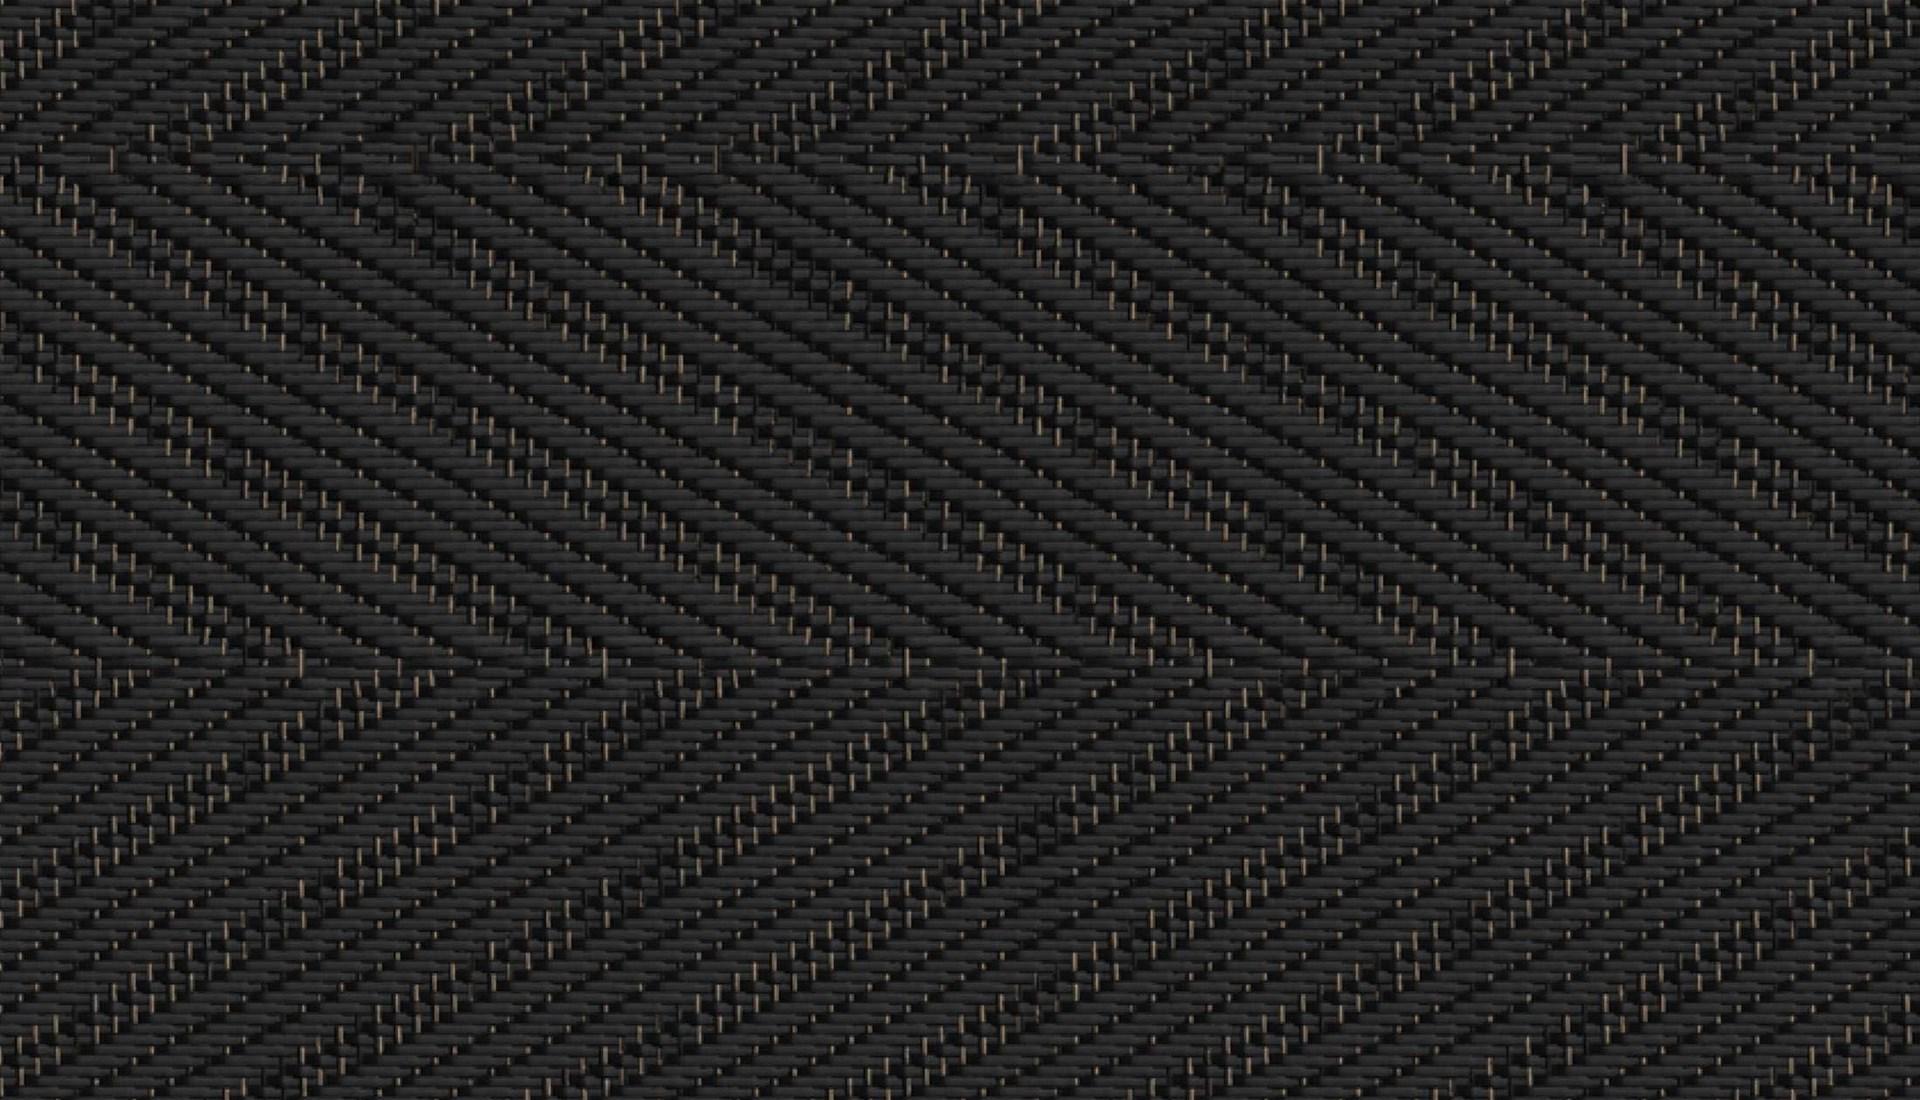 Graphic Herringboneblack2 2x